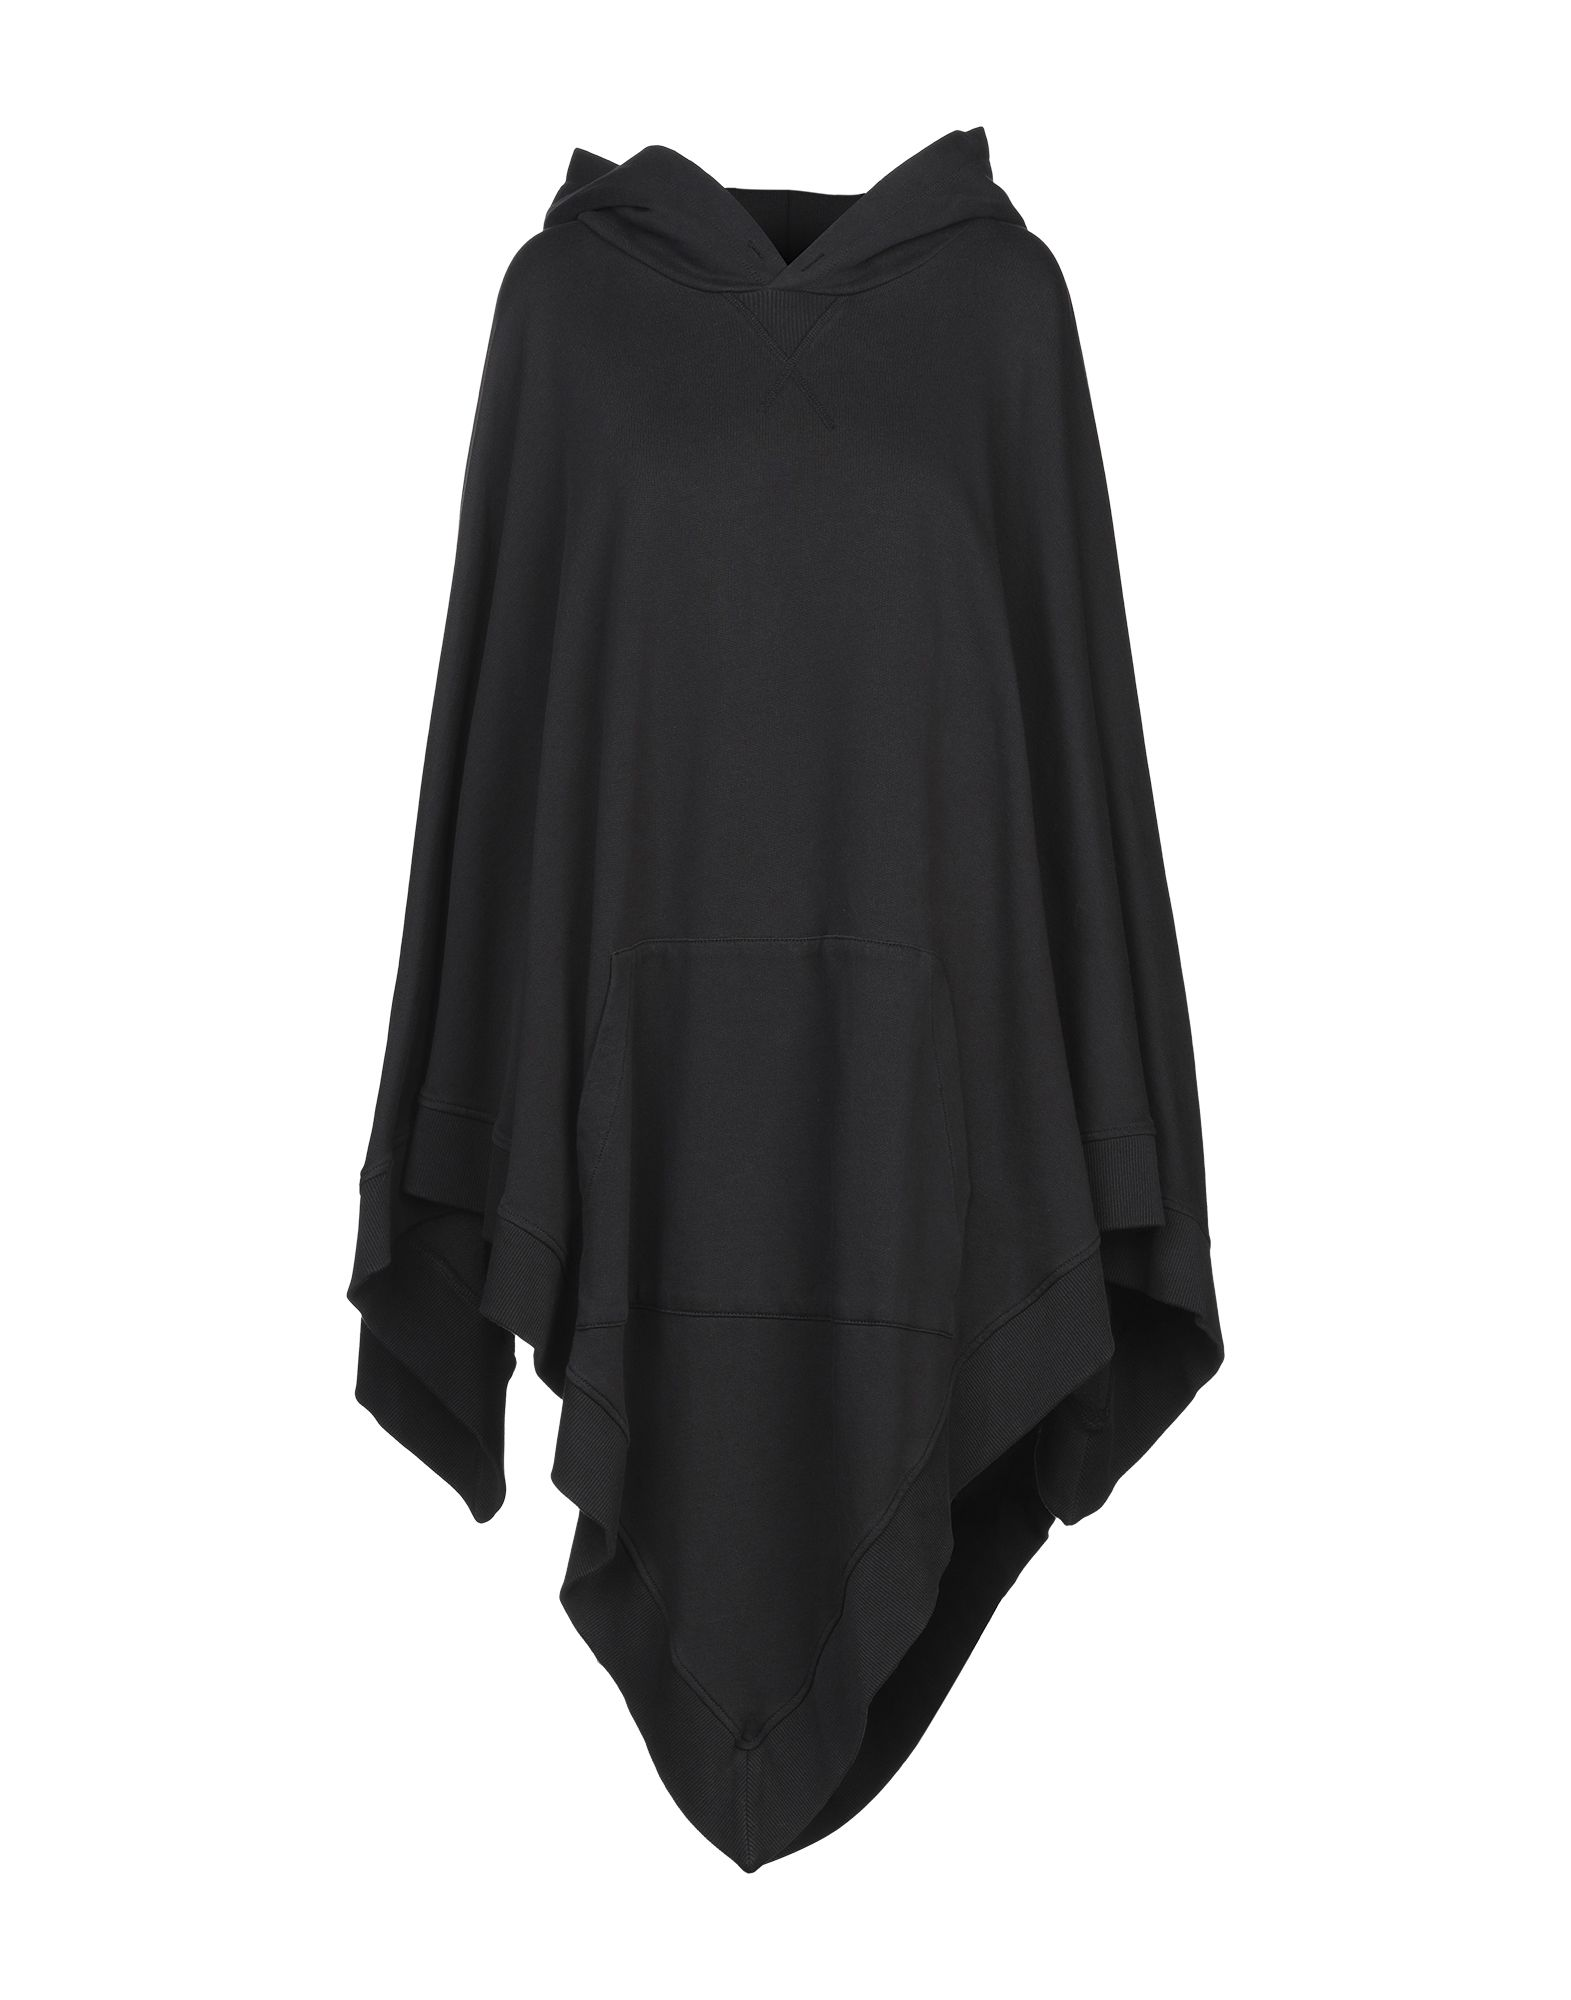 MM6 MAISON MARGIELA Capes & ponchos. sweatshirt fleece, no appliqués, basic solid color, single-breasted, hooded collar, single pocket, sleeveless, french terry lining. 100% Cotton, Elastane